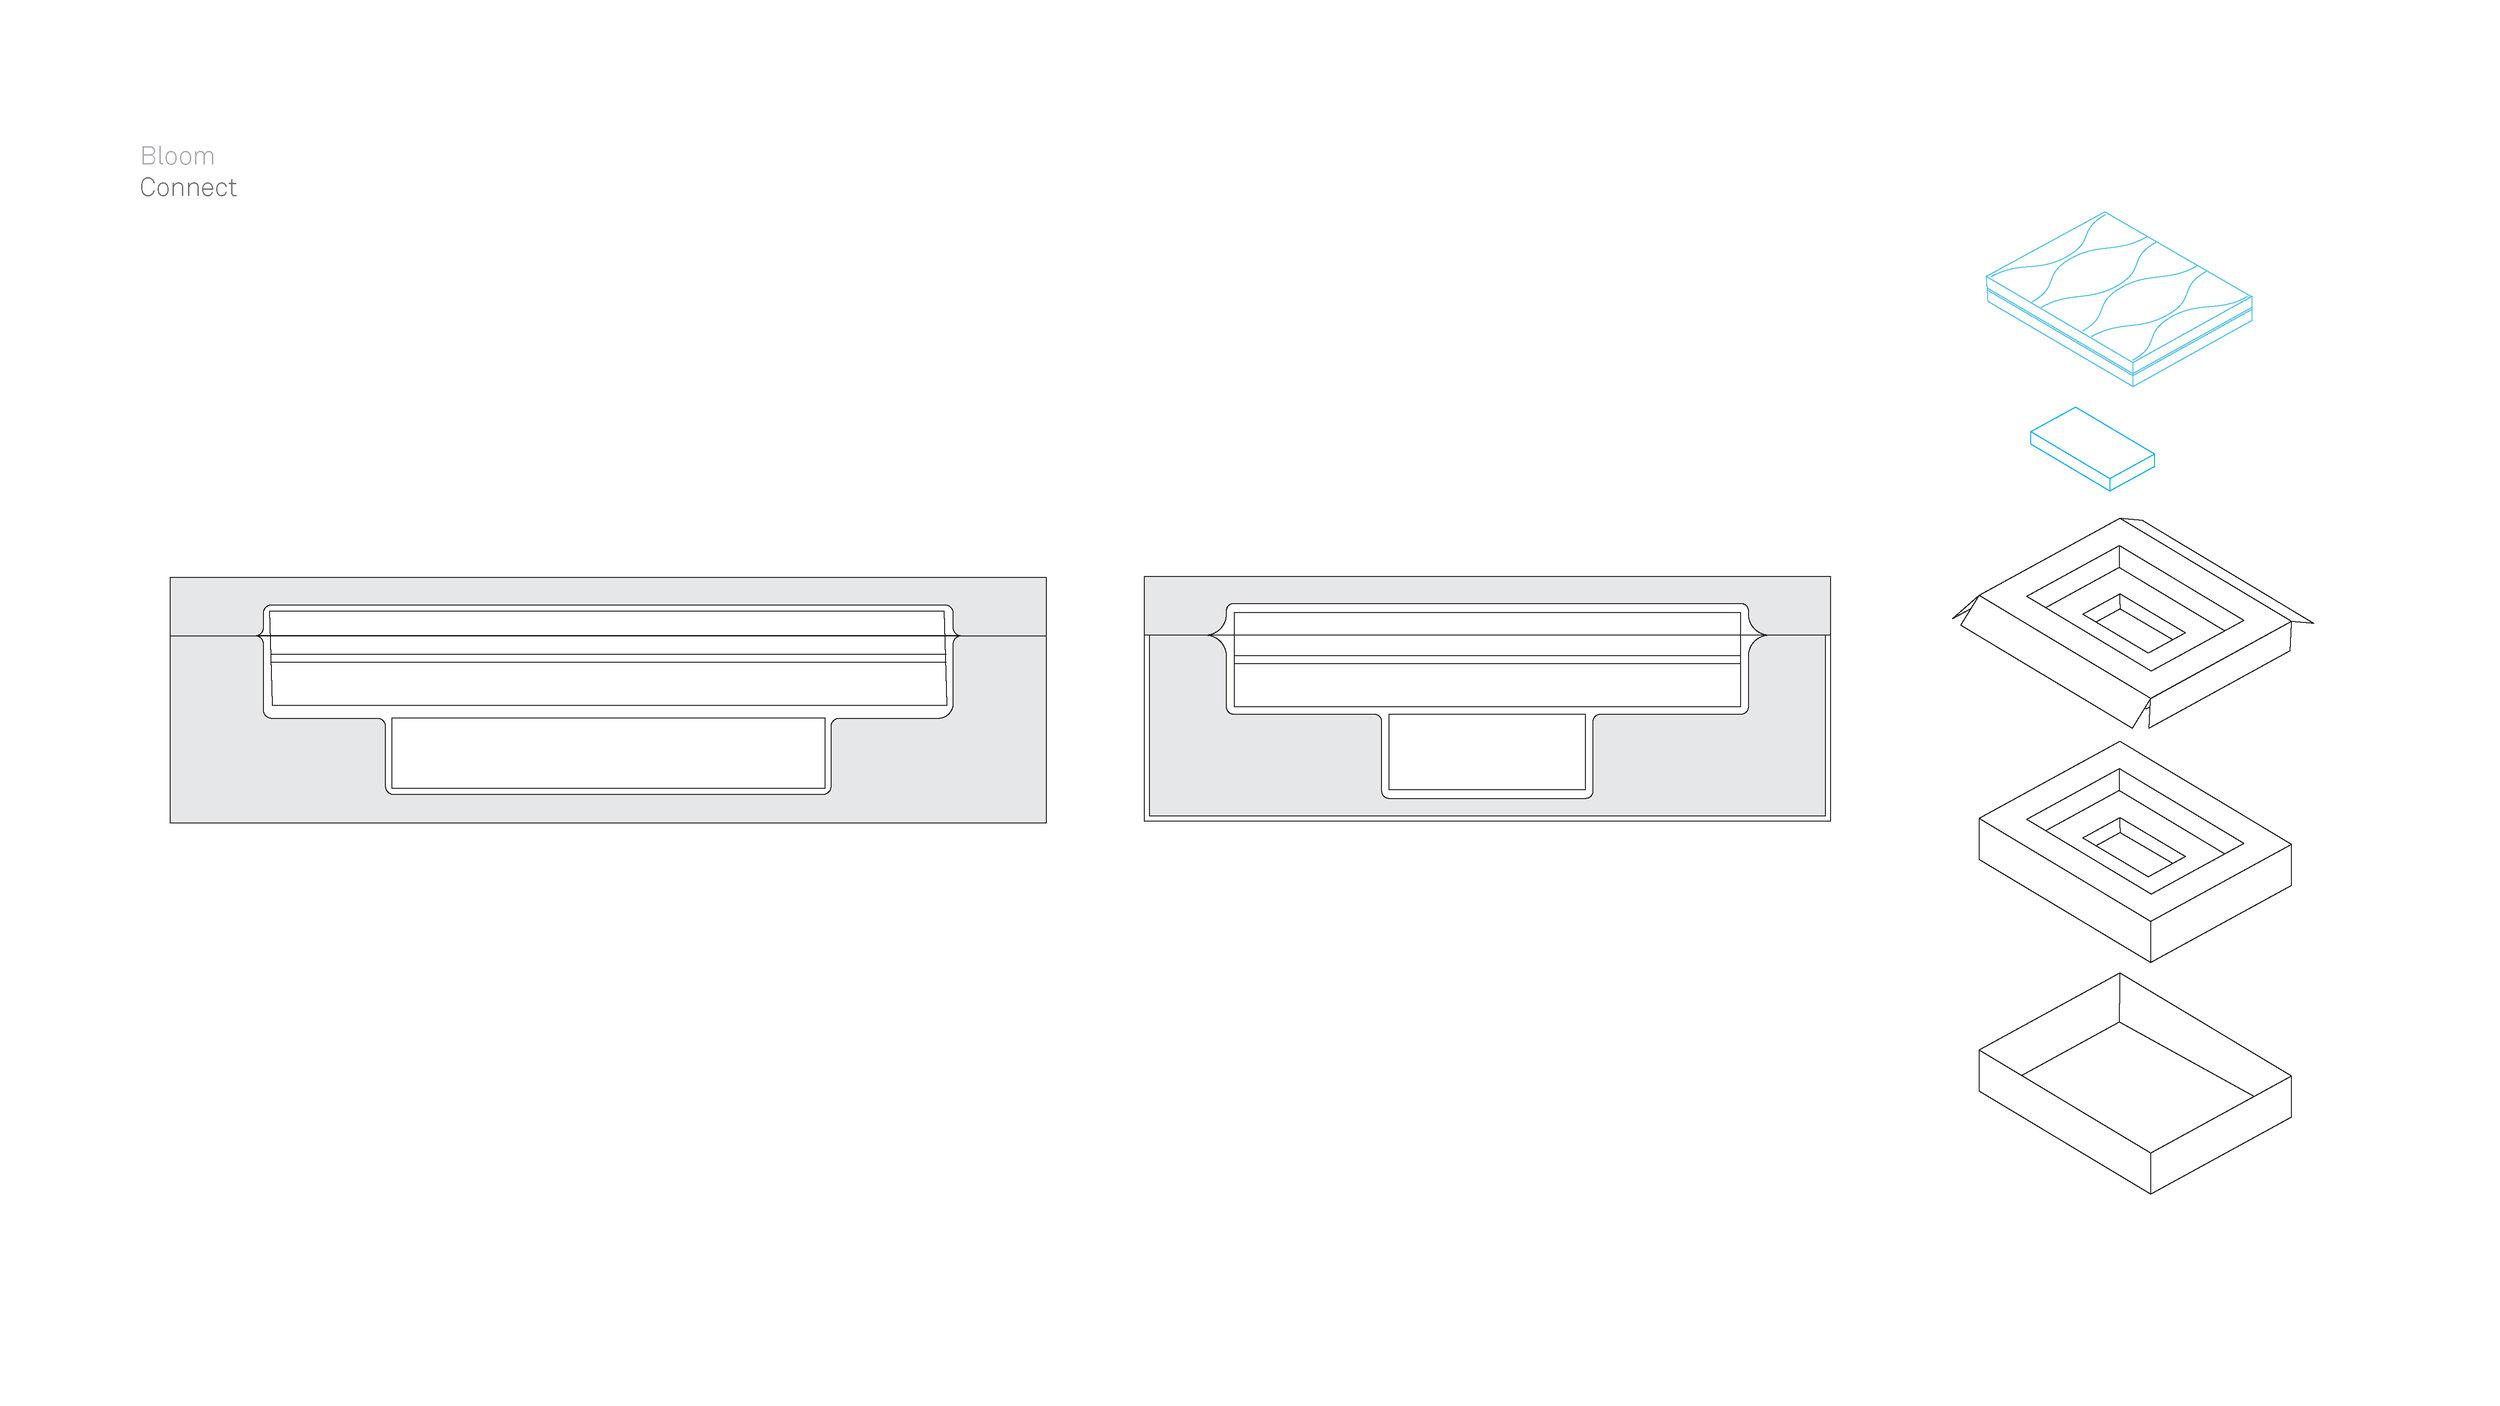 B&W_LibertySuite_PackagingStructure_R183.jpg